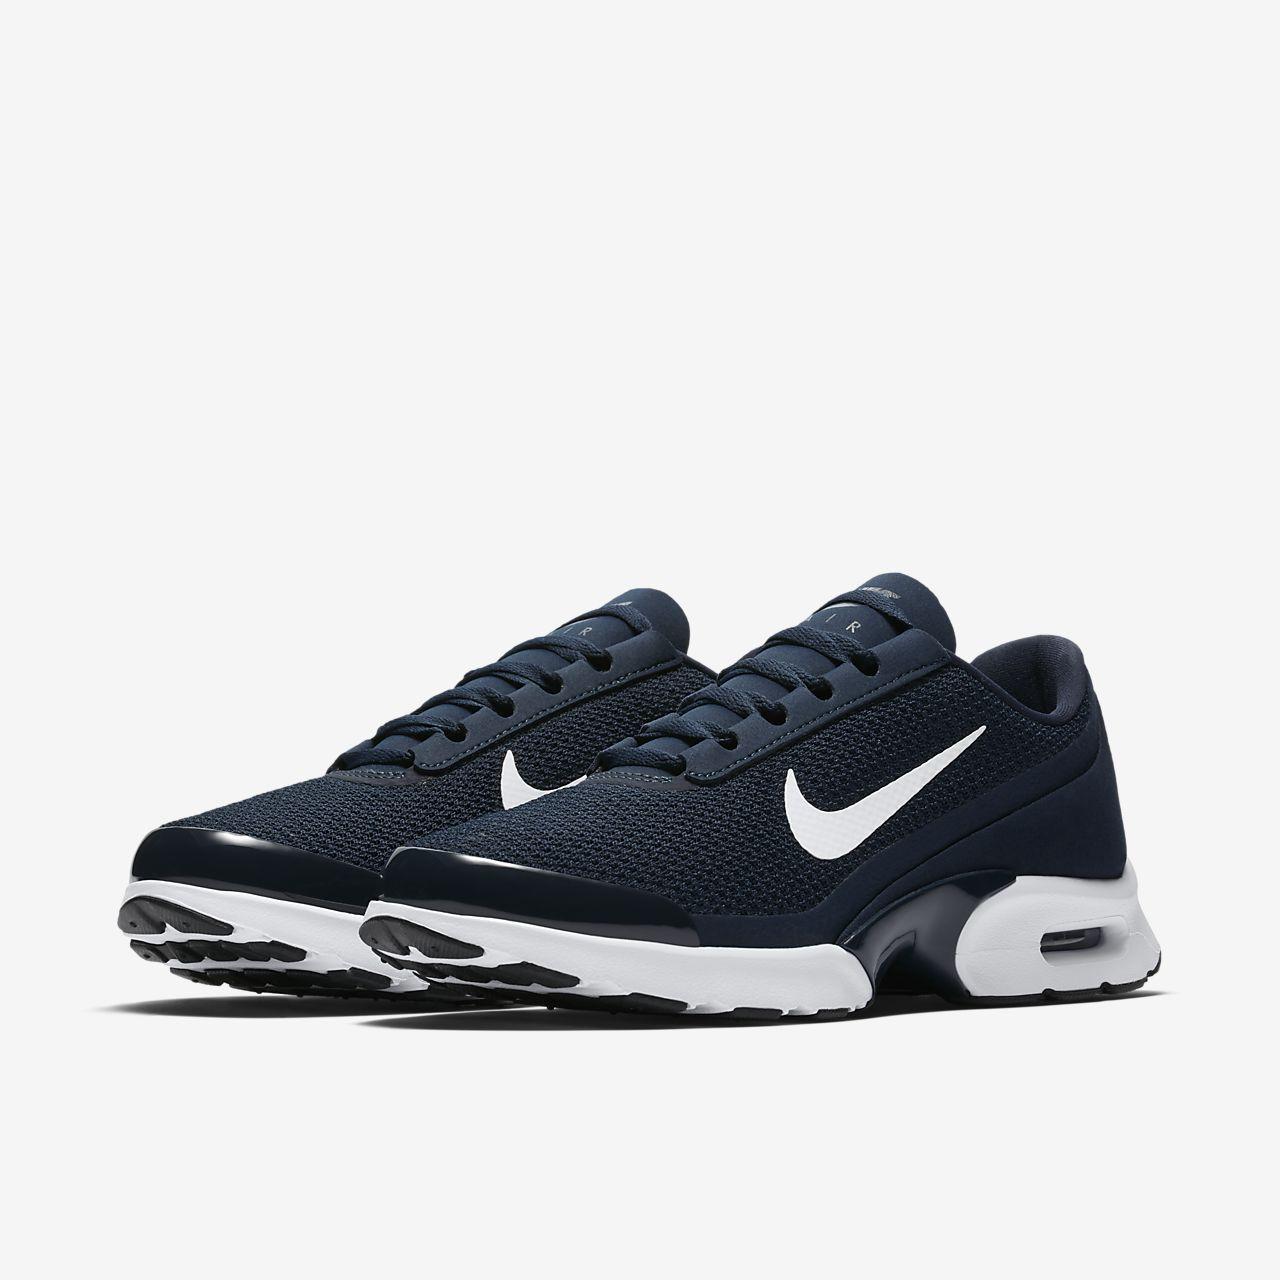 Nike Air Max Jewell Damenschuh - Blau